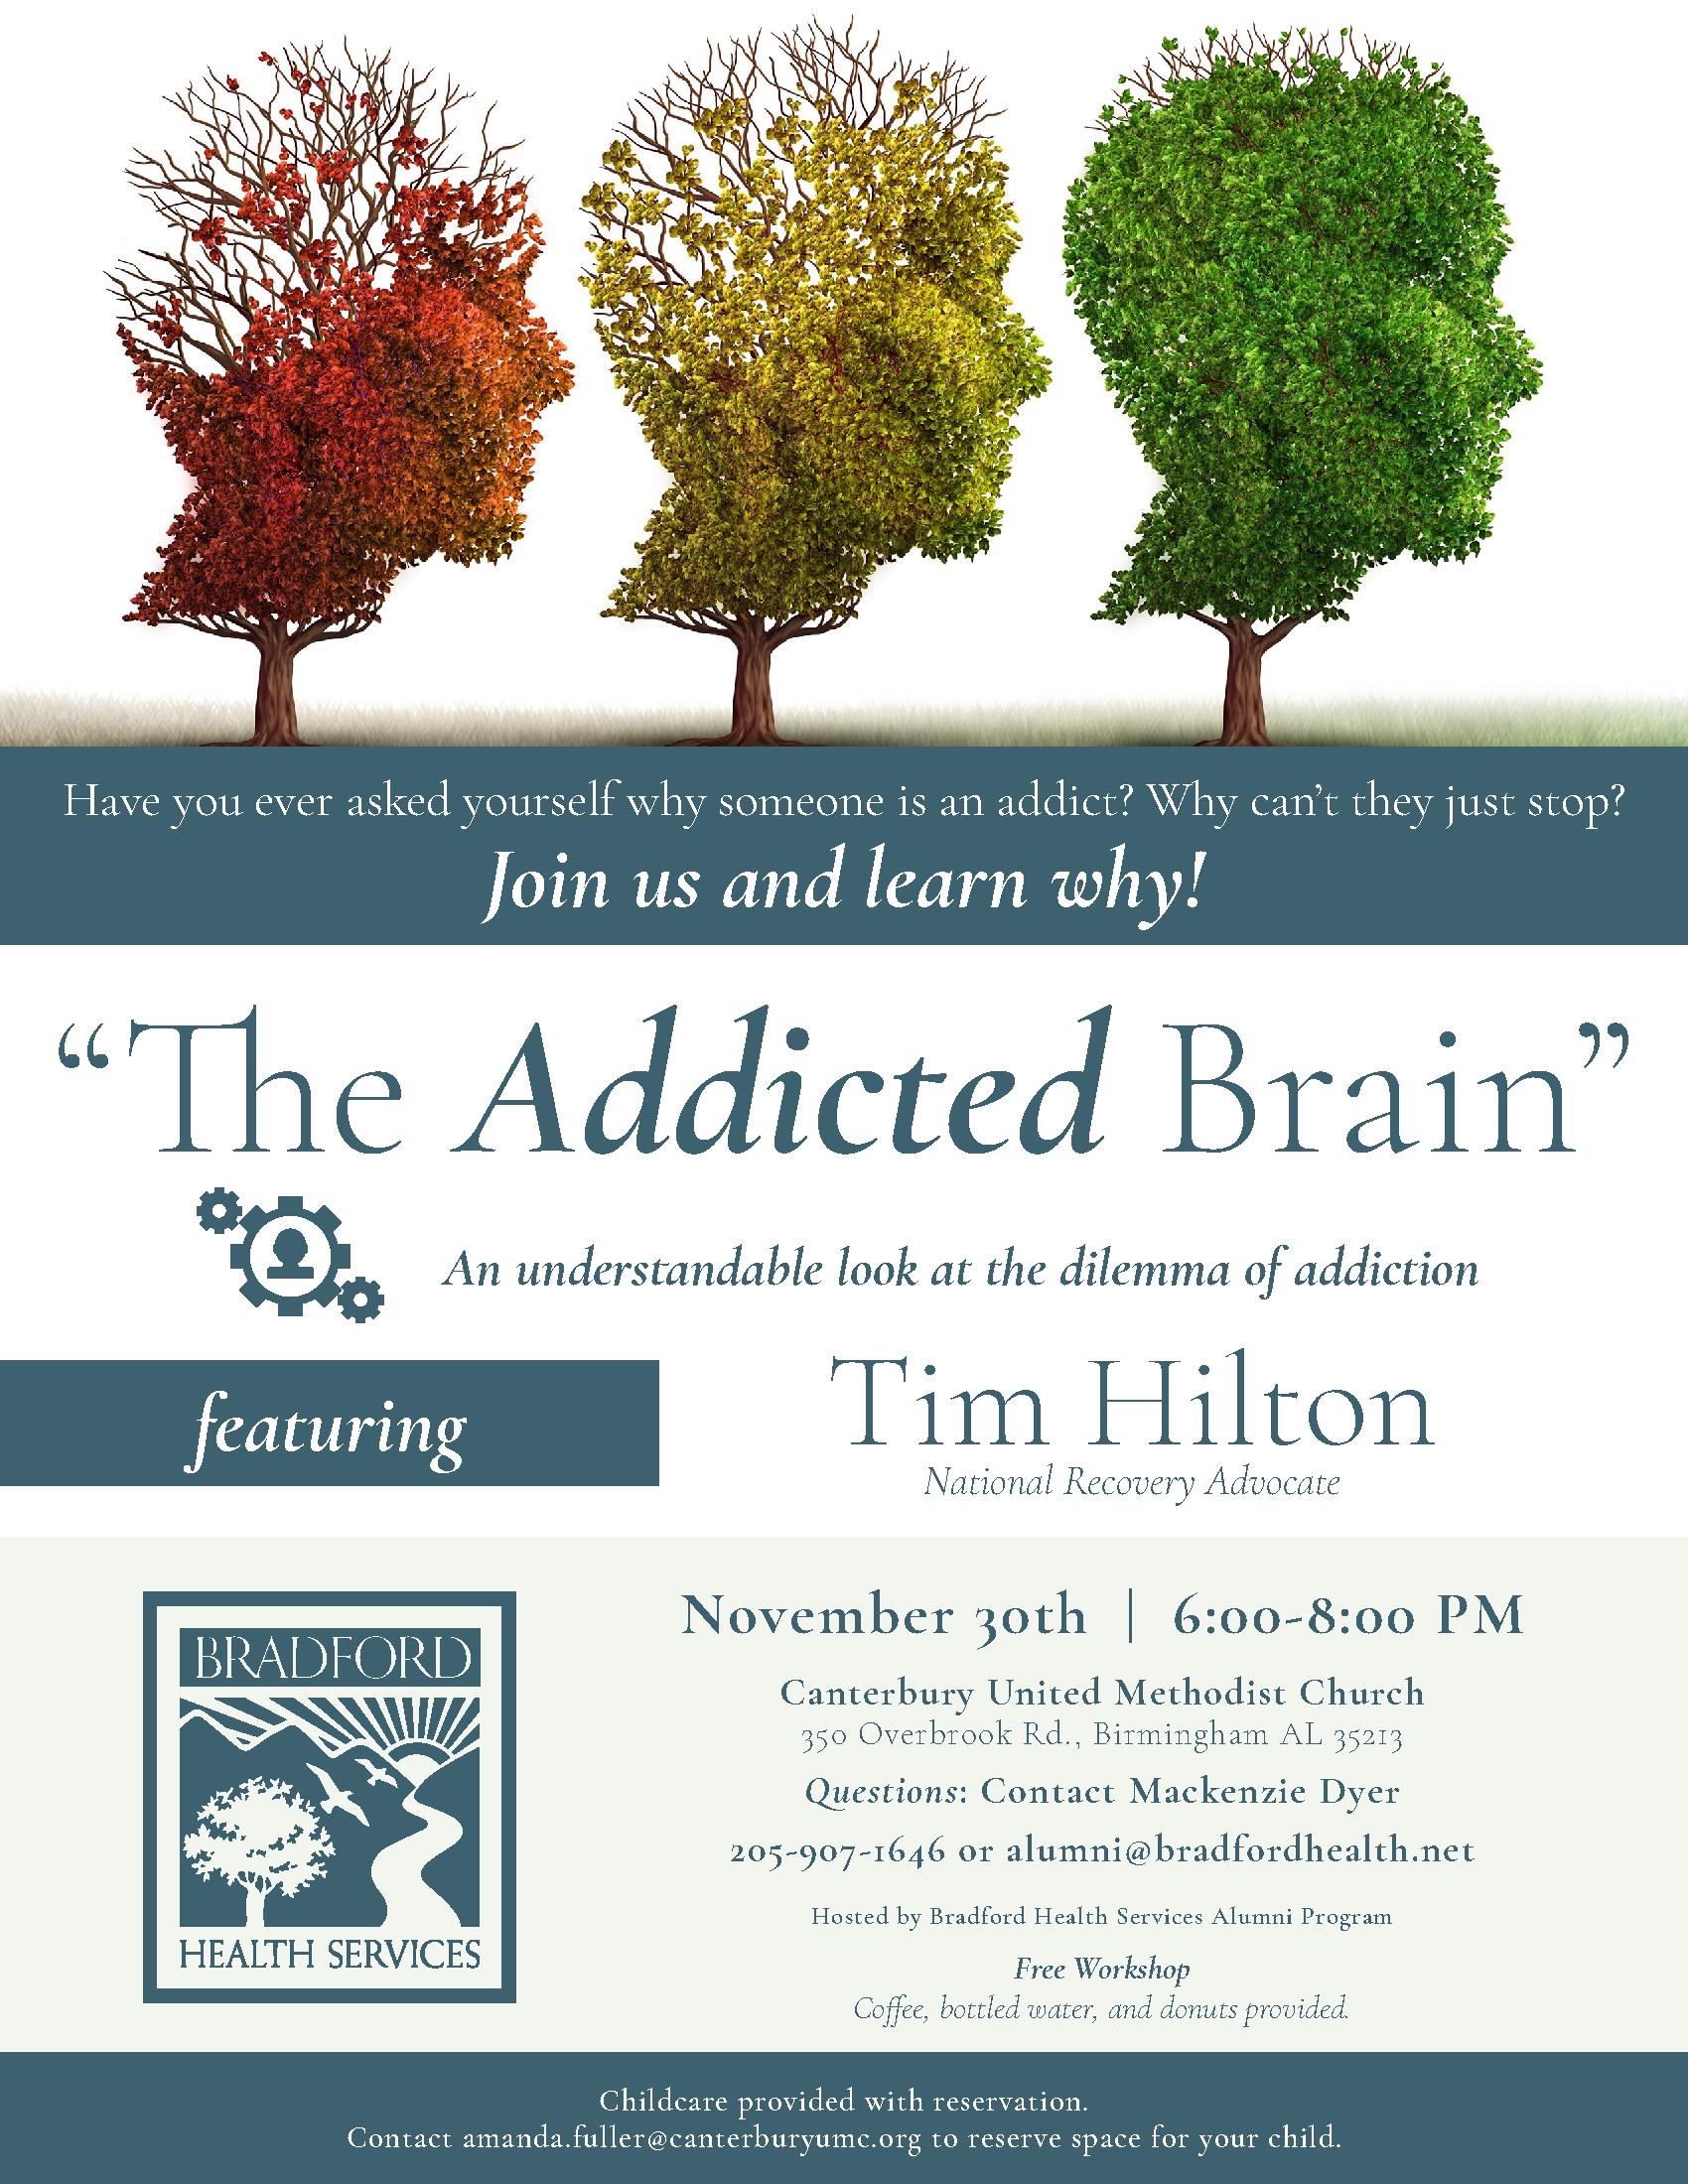 170557_Bradford- PRT10 - Addicted Brain Flyer_p4.png